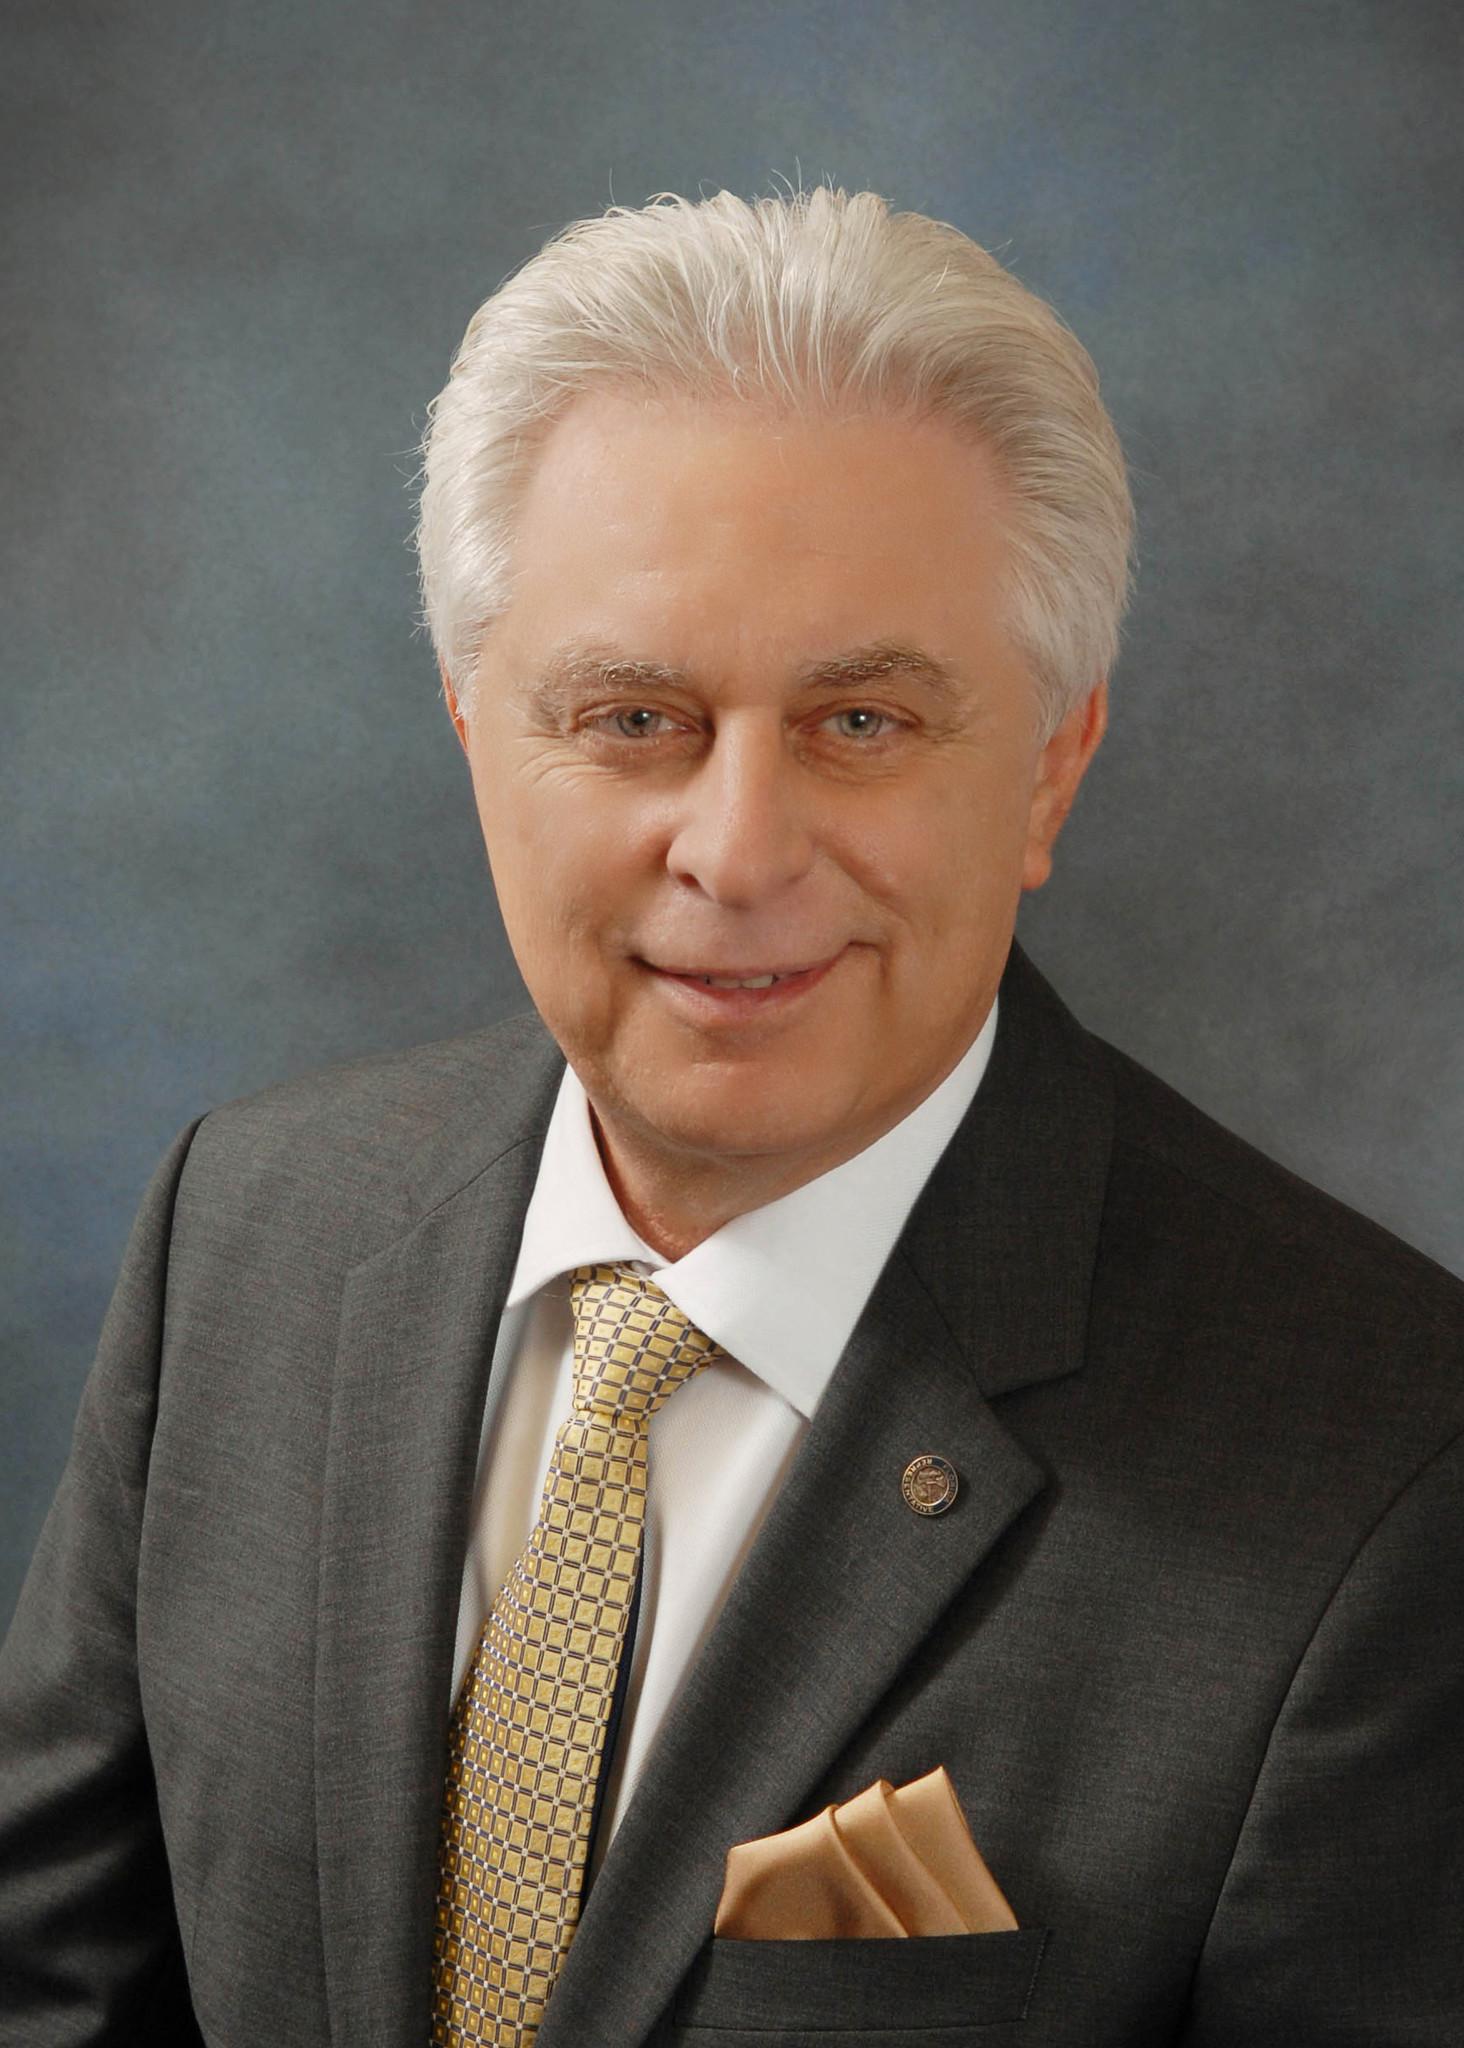 Health Insurance Florida >> Richard Stark, member, Florida House of Representatives - Sun Sentinel